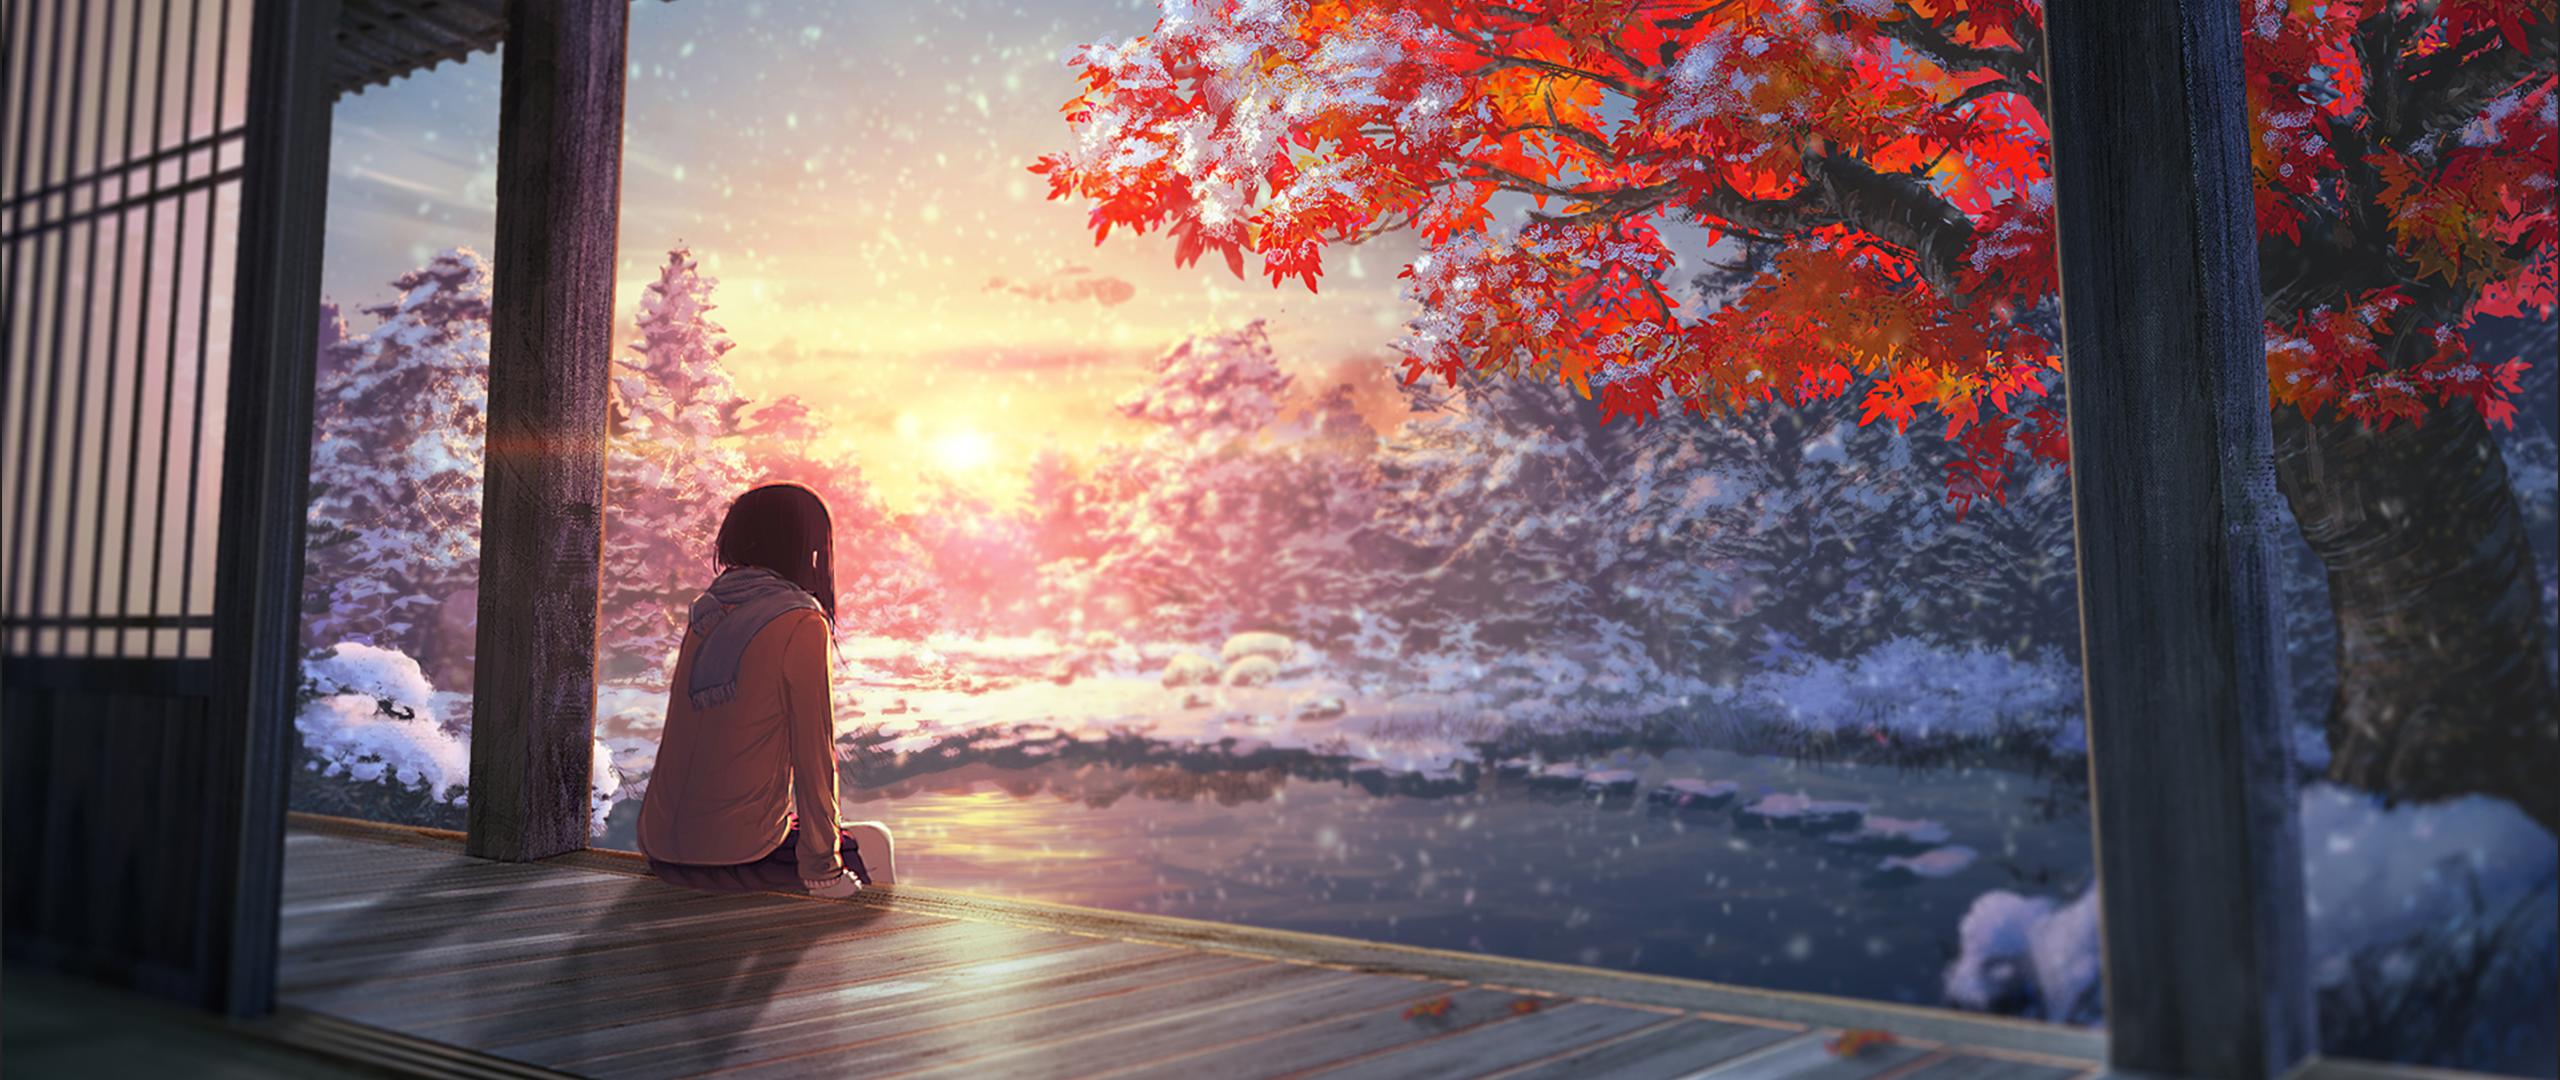 Ultra Wide Japan Anime Girls Artwork Snow Sunlight Wallpaper Anime Scenery Scenery Wallpaper Anime Background